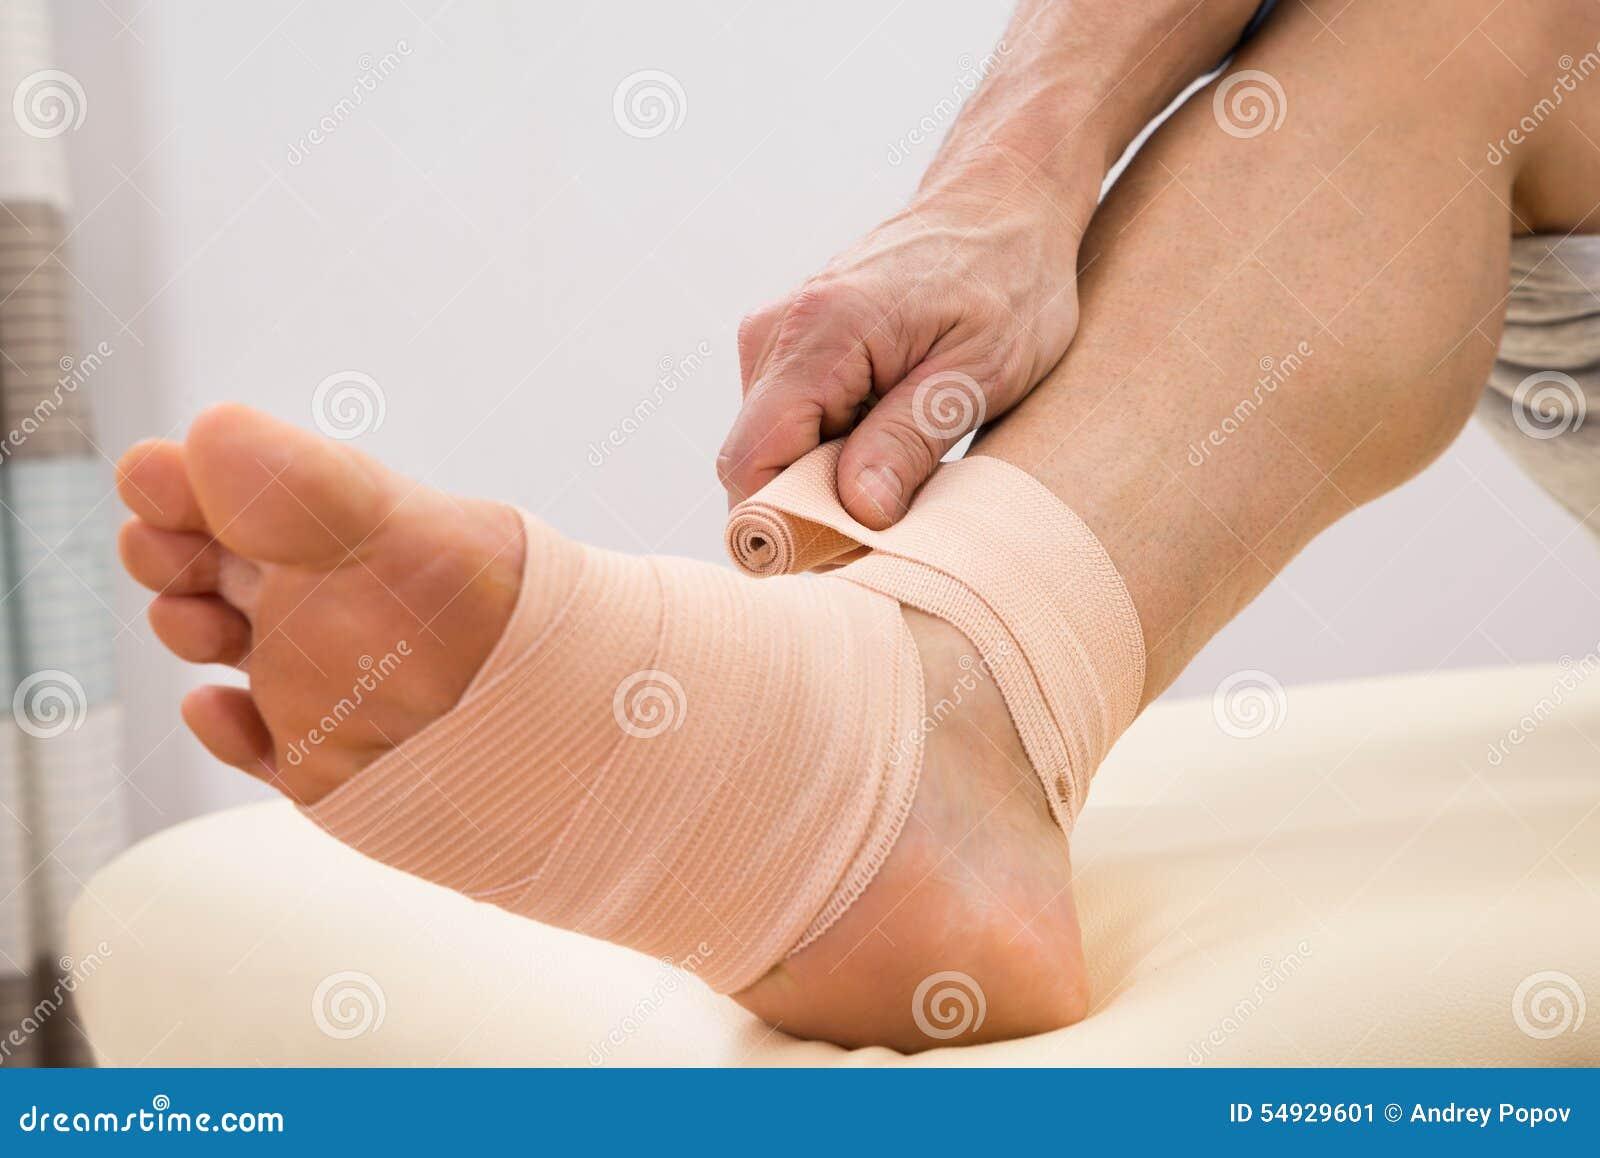 Man putting elastic bandage on foot